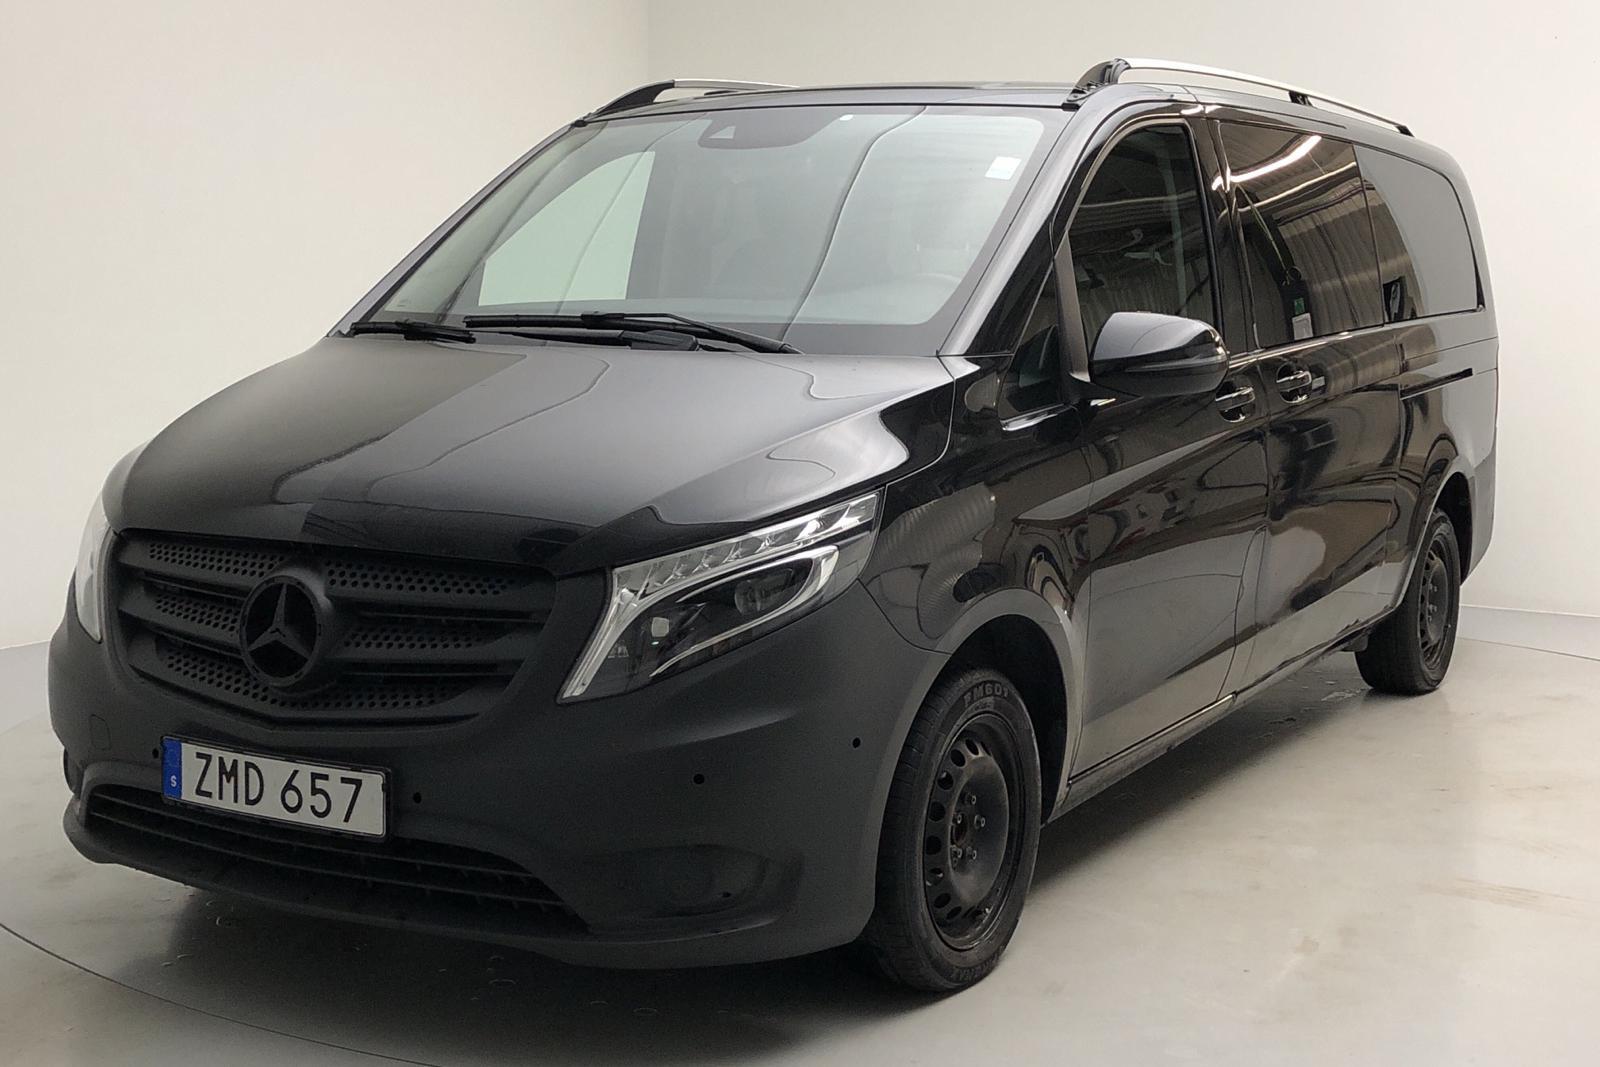 Mercedes V 220 d W447 (163hk) - 0 km - Automatic - black - 2019